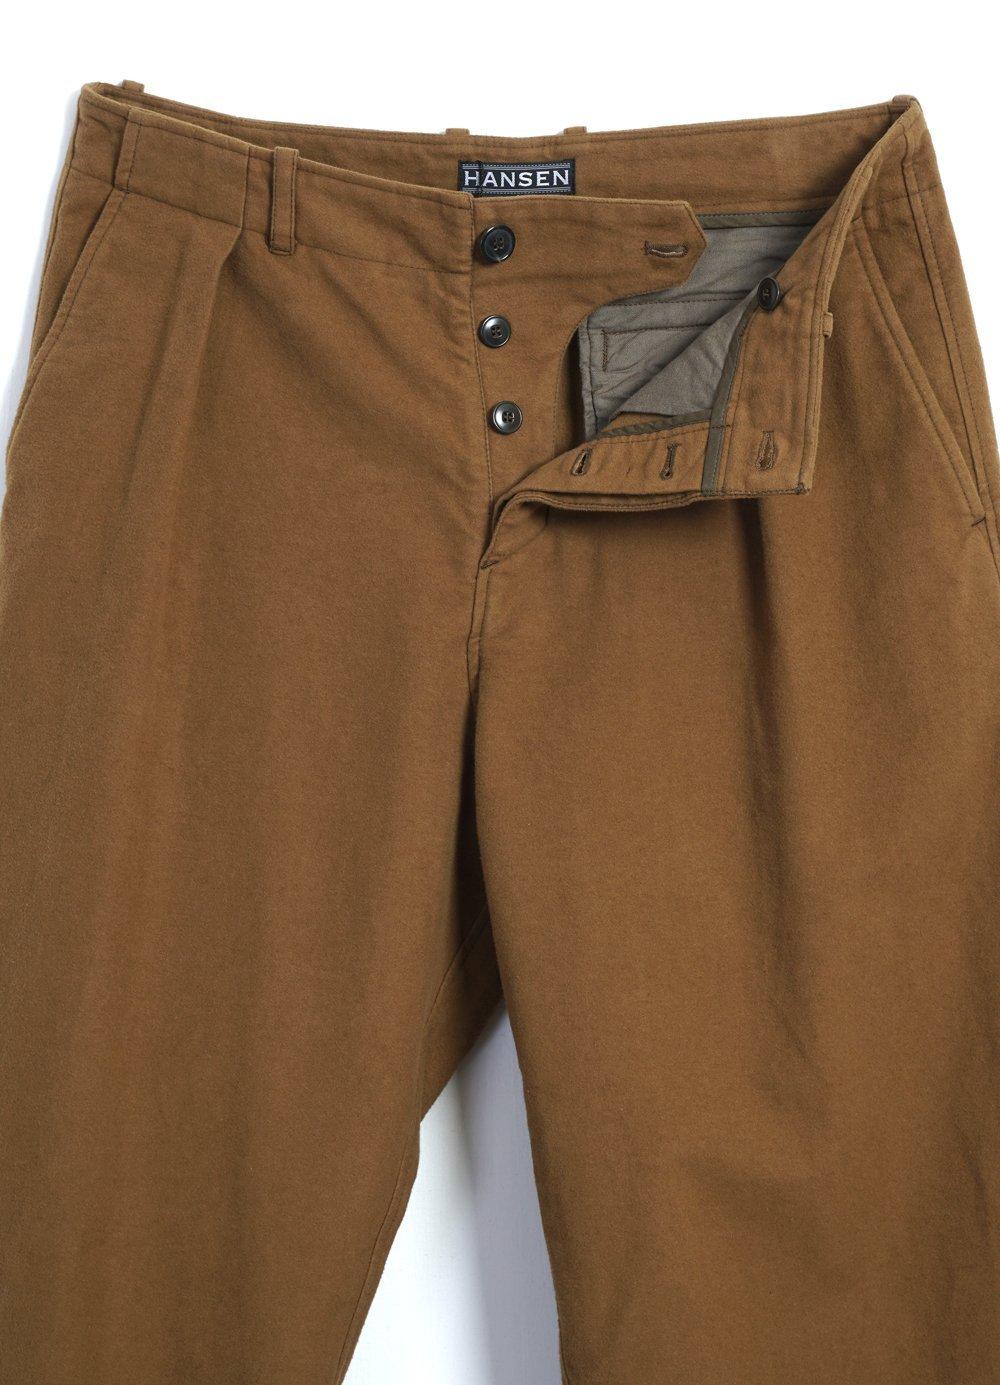 Hansen Garments BOBBY   Super Wide Pleated Trousers   turmeric